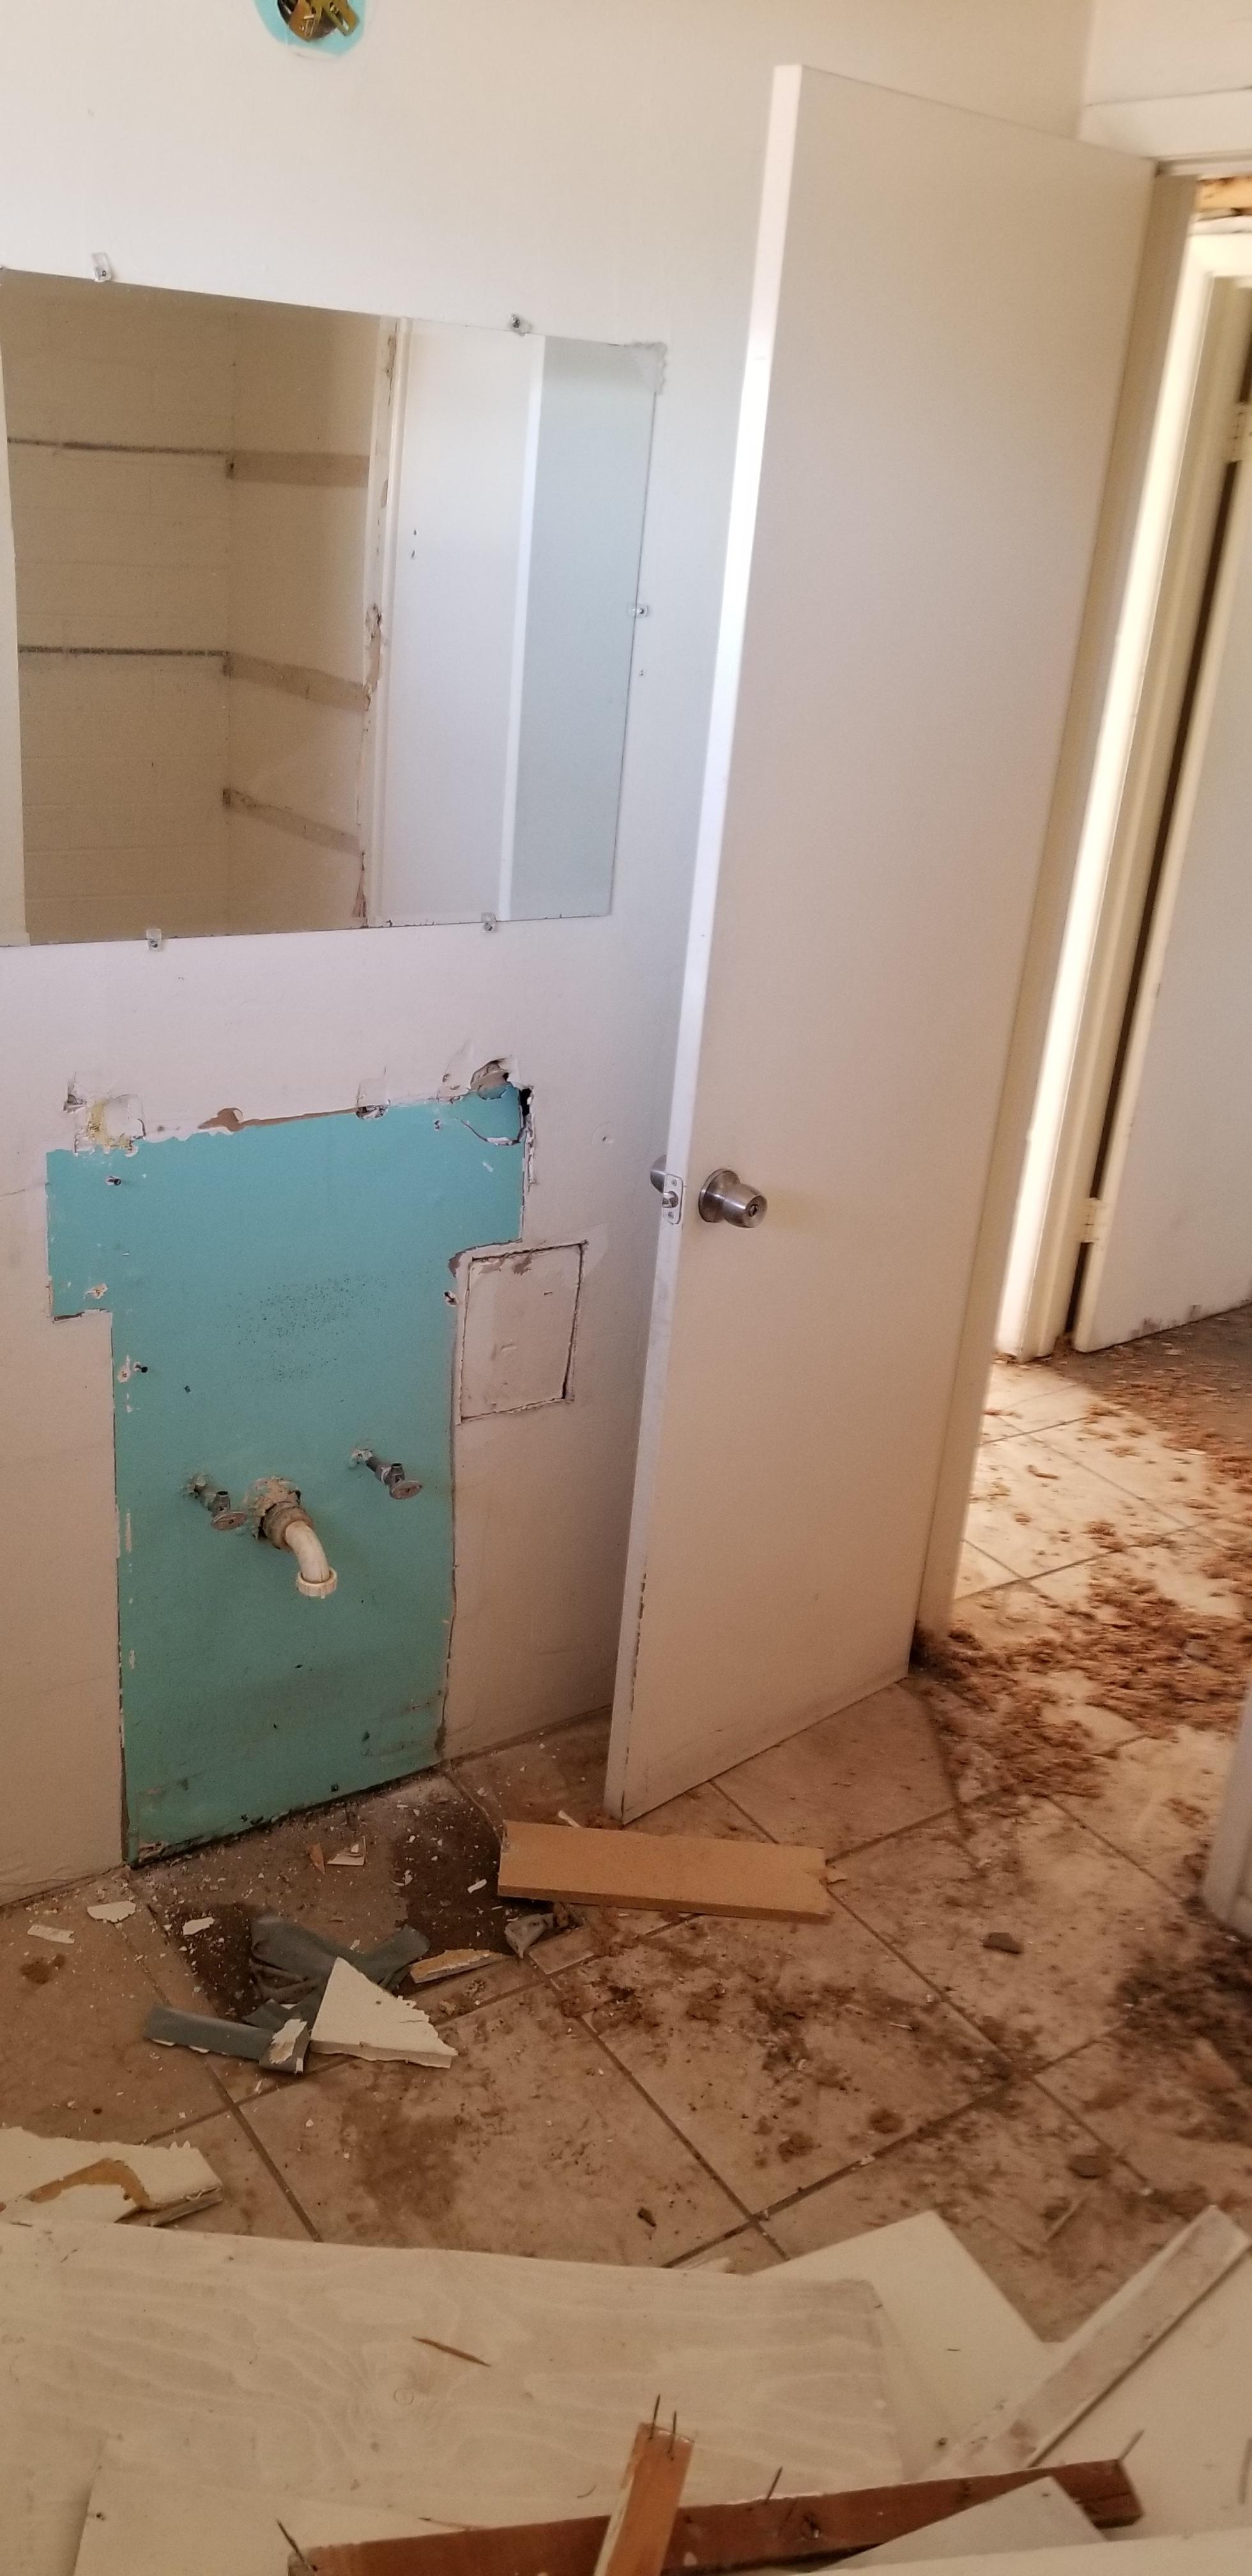 Vanity/toilet demo